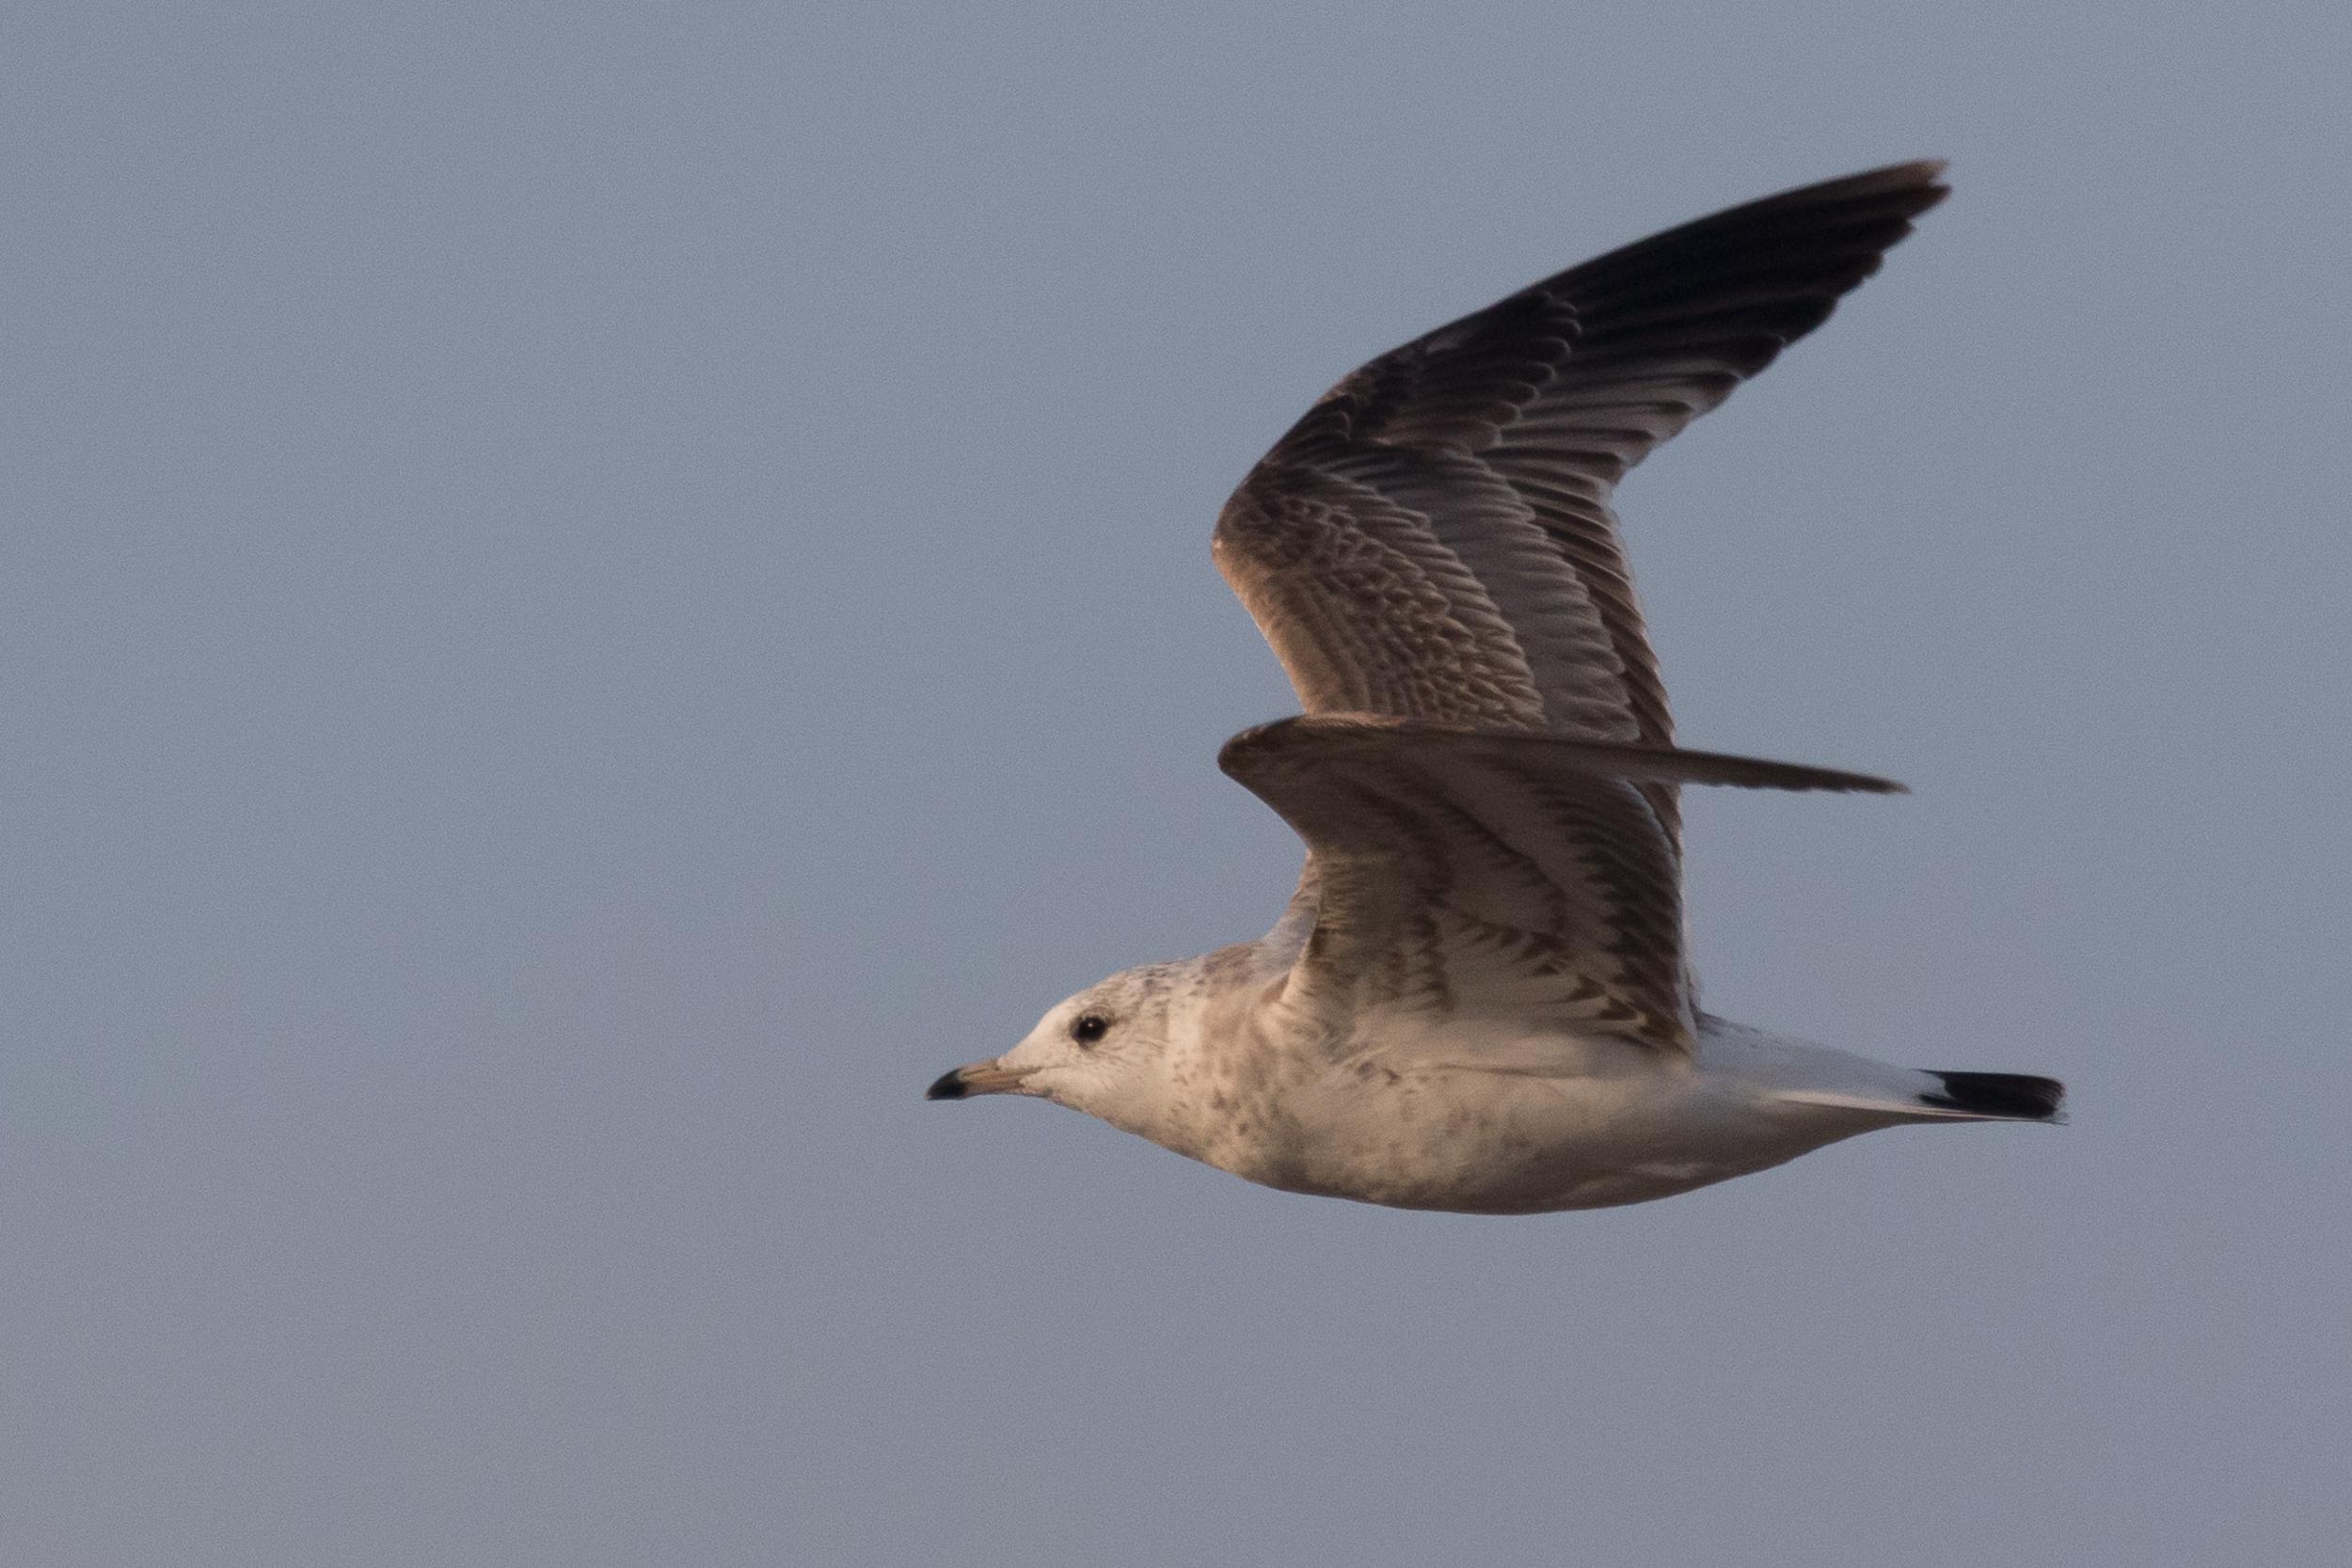 20170126-Common Gull 2CY-39.jpg